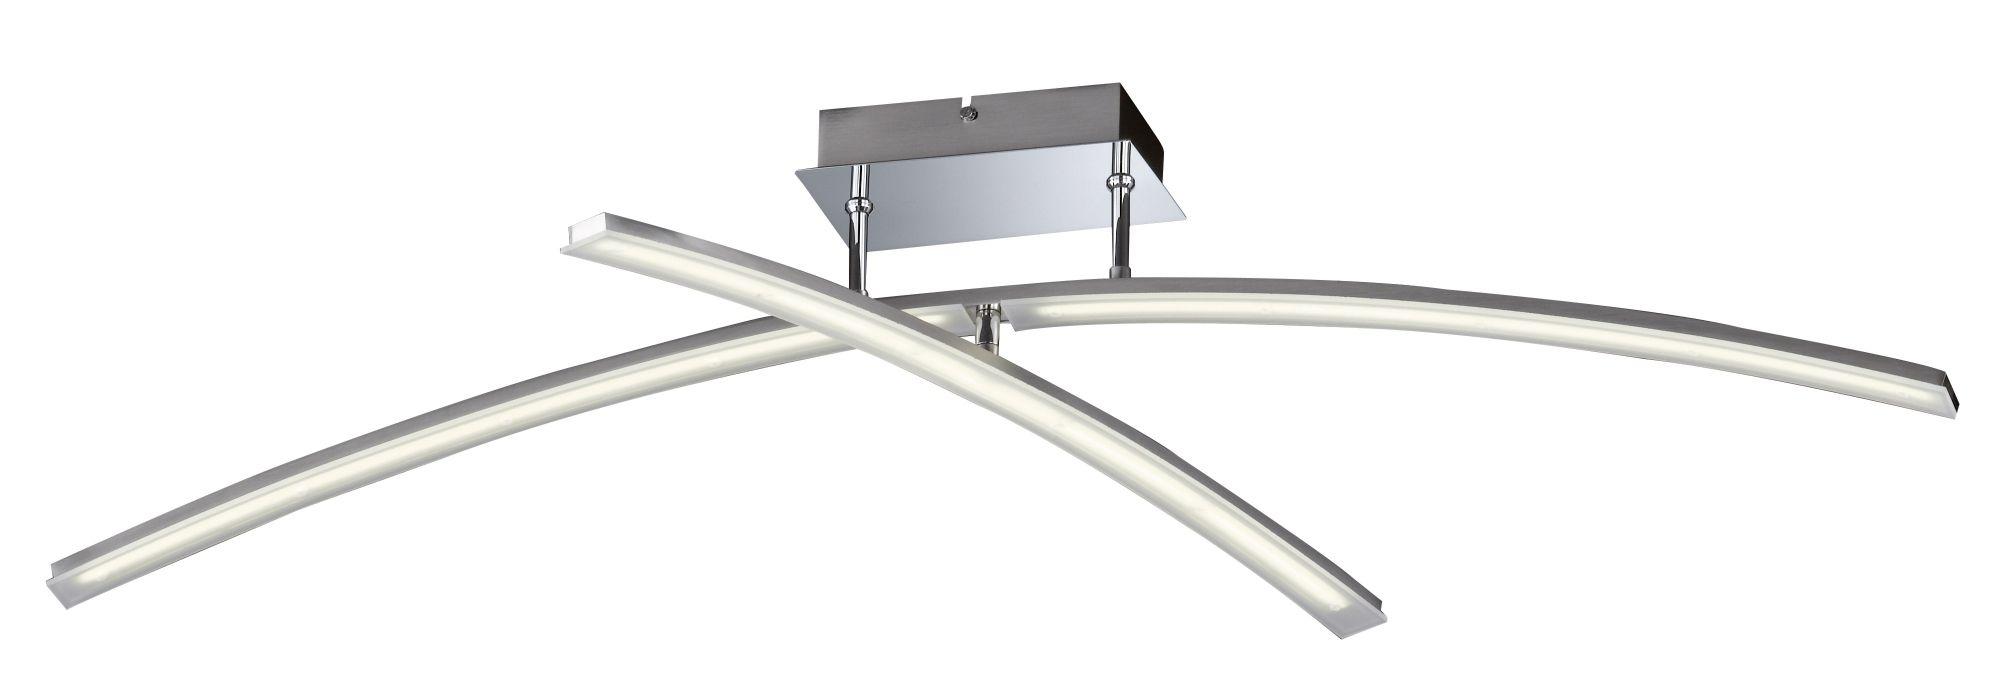 HONSEL LEUCHTEN Honsel Leuchten LED-Deckenlleuchte, 2flg., »MIKADO«